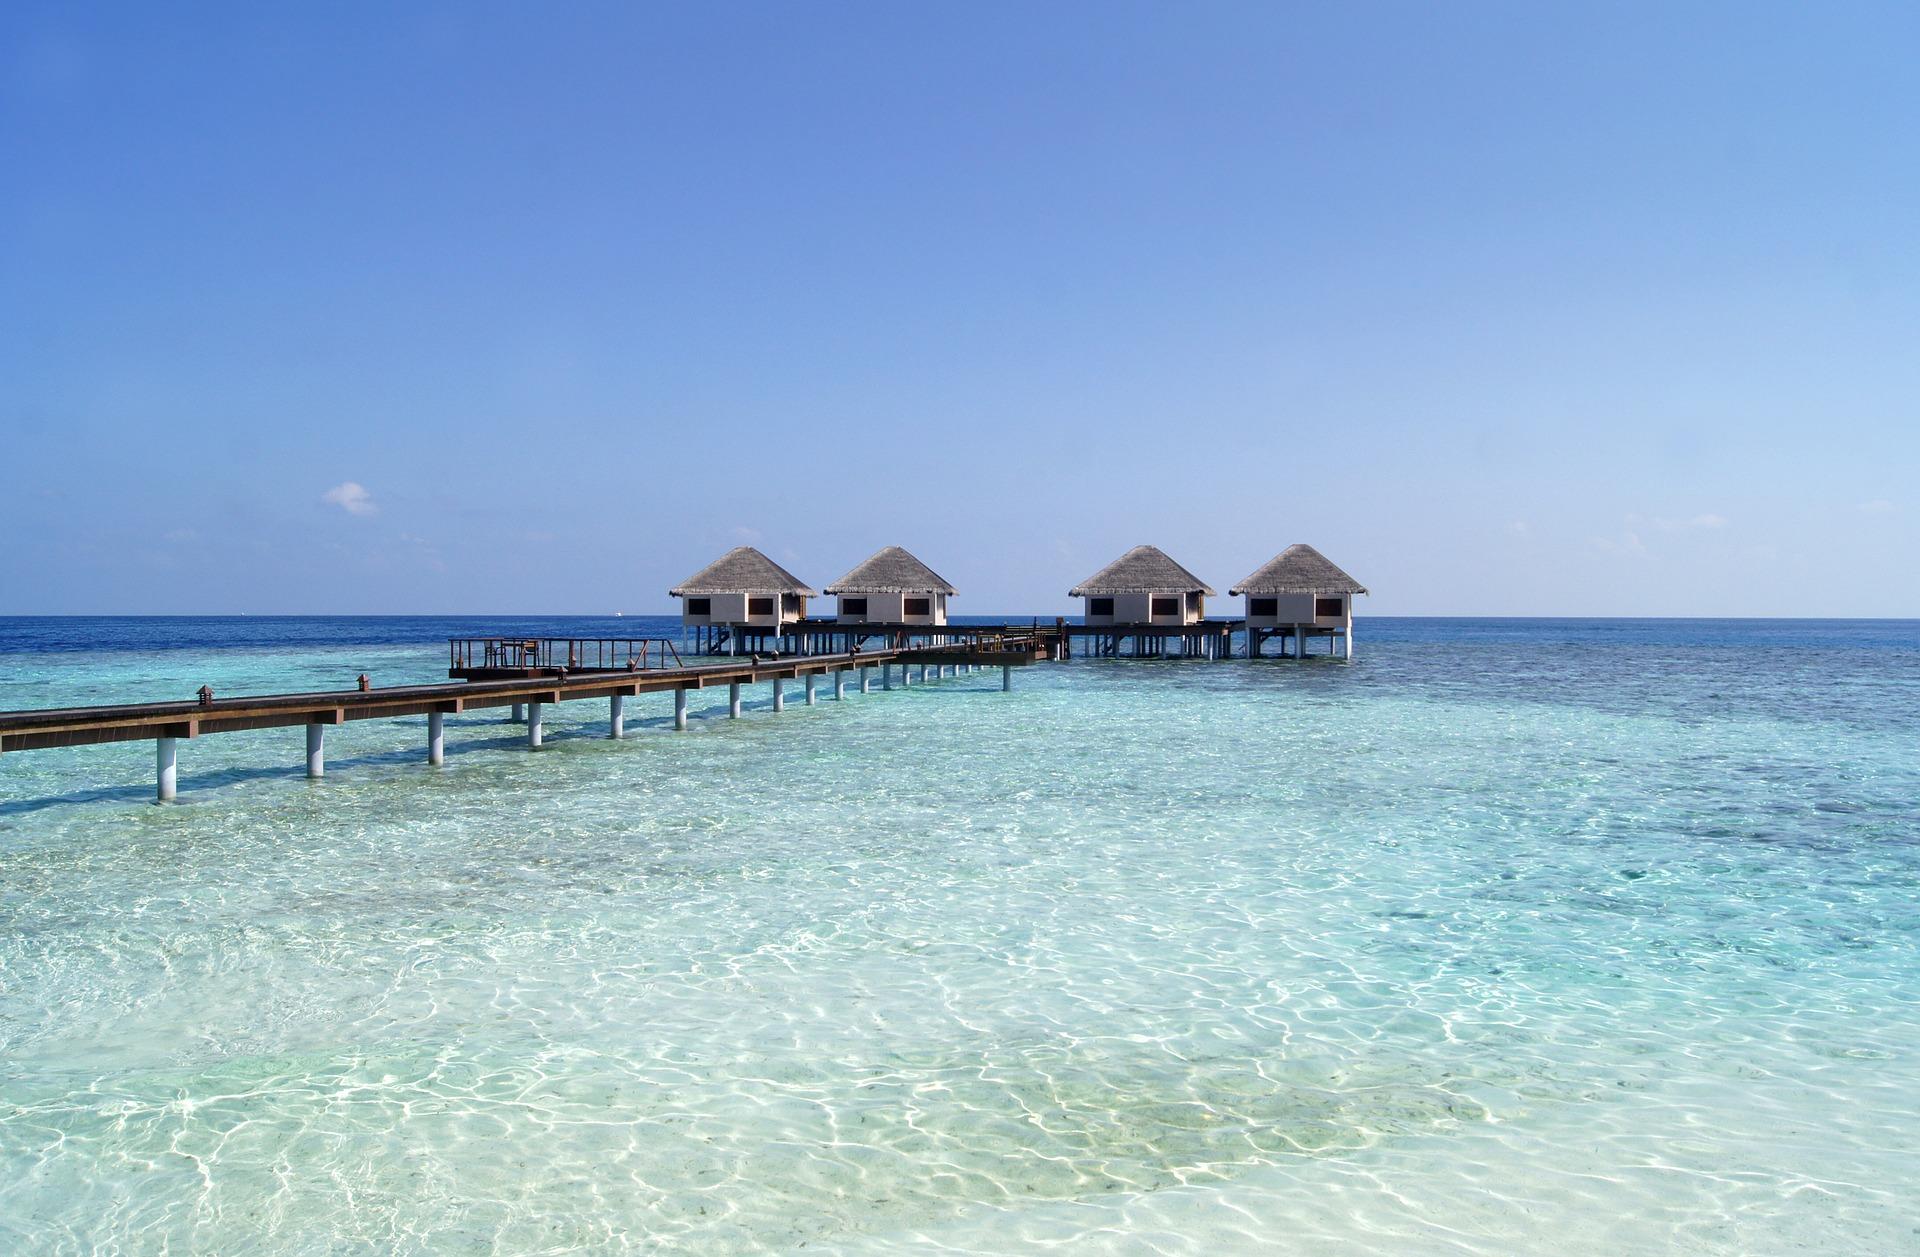 maldives-2190384_1920 (1)